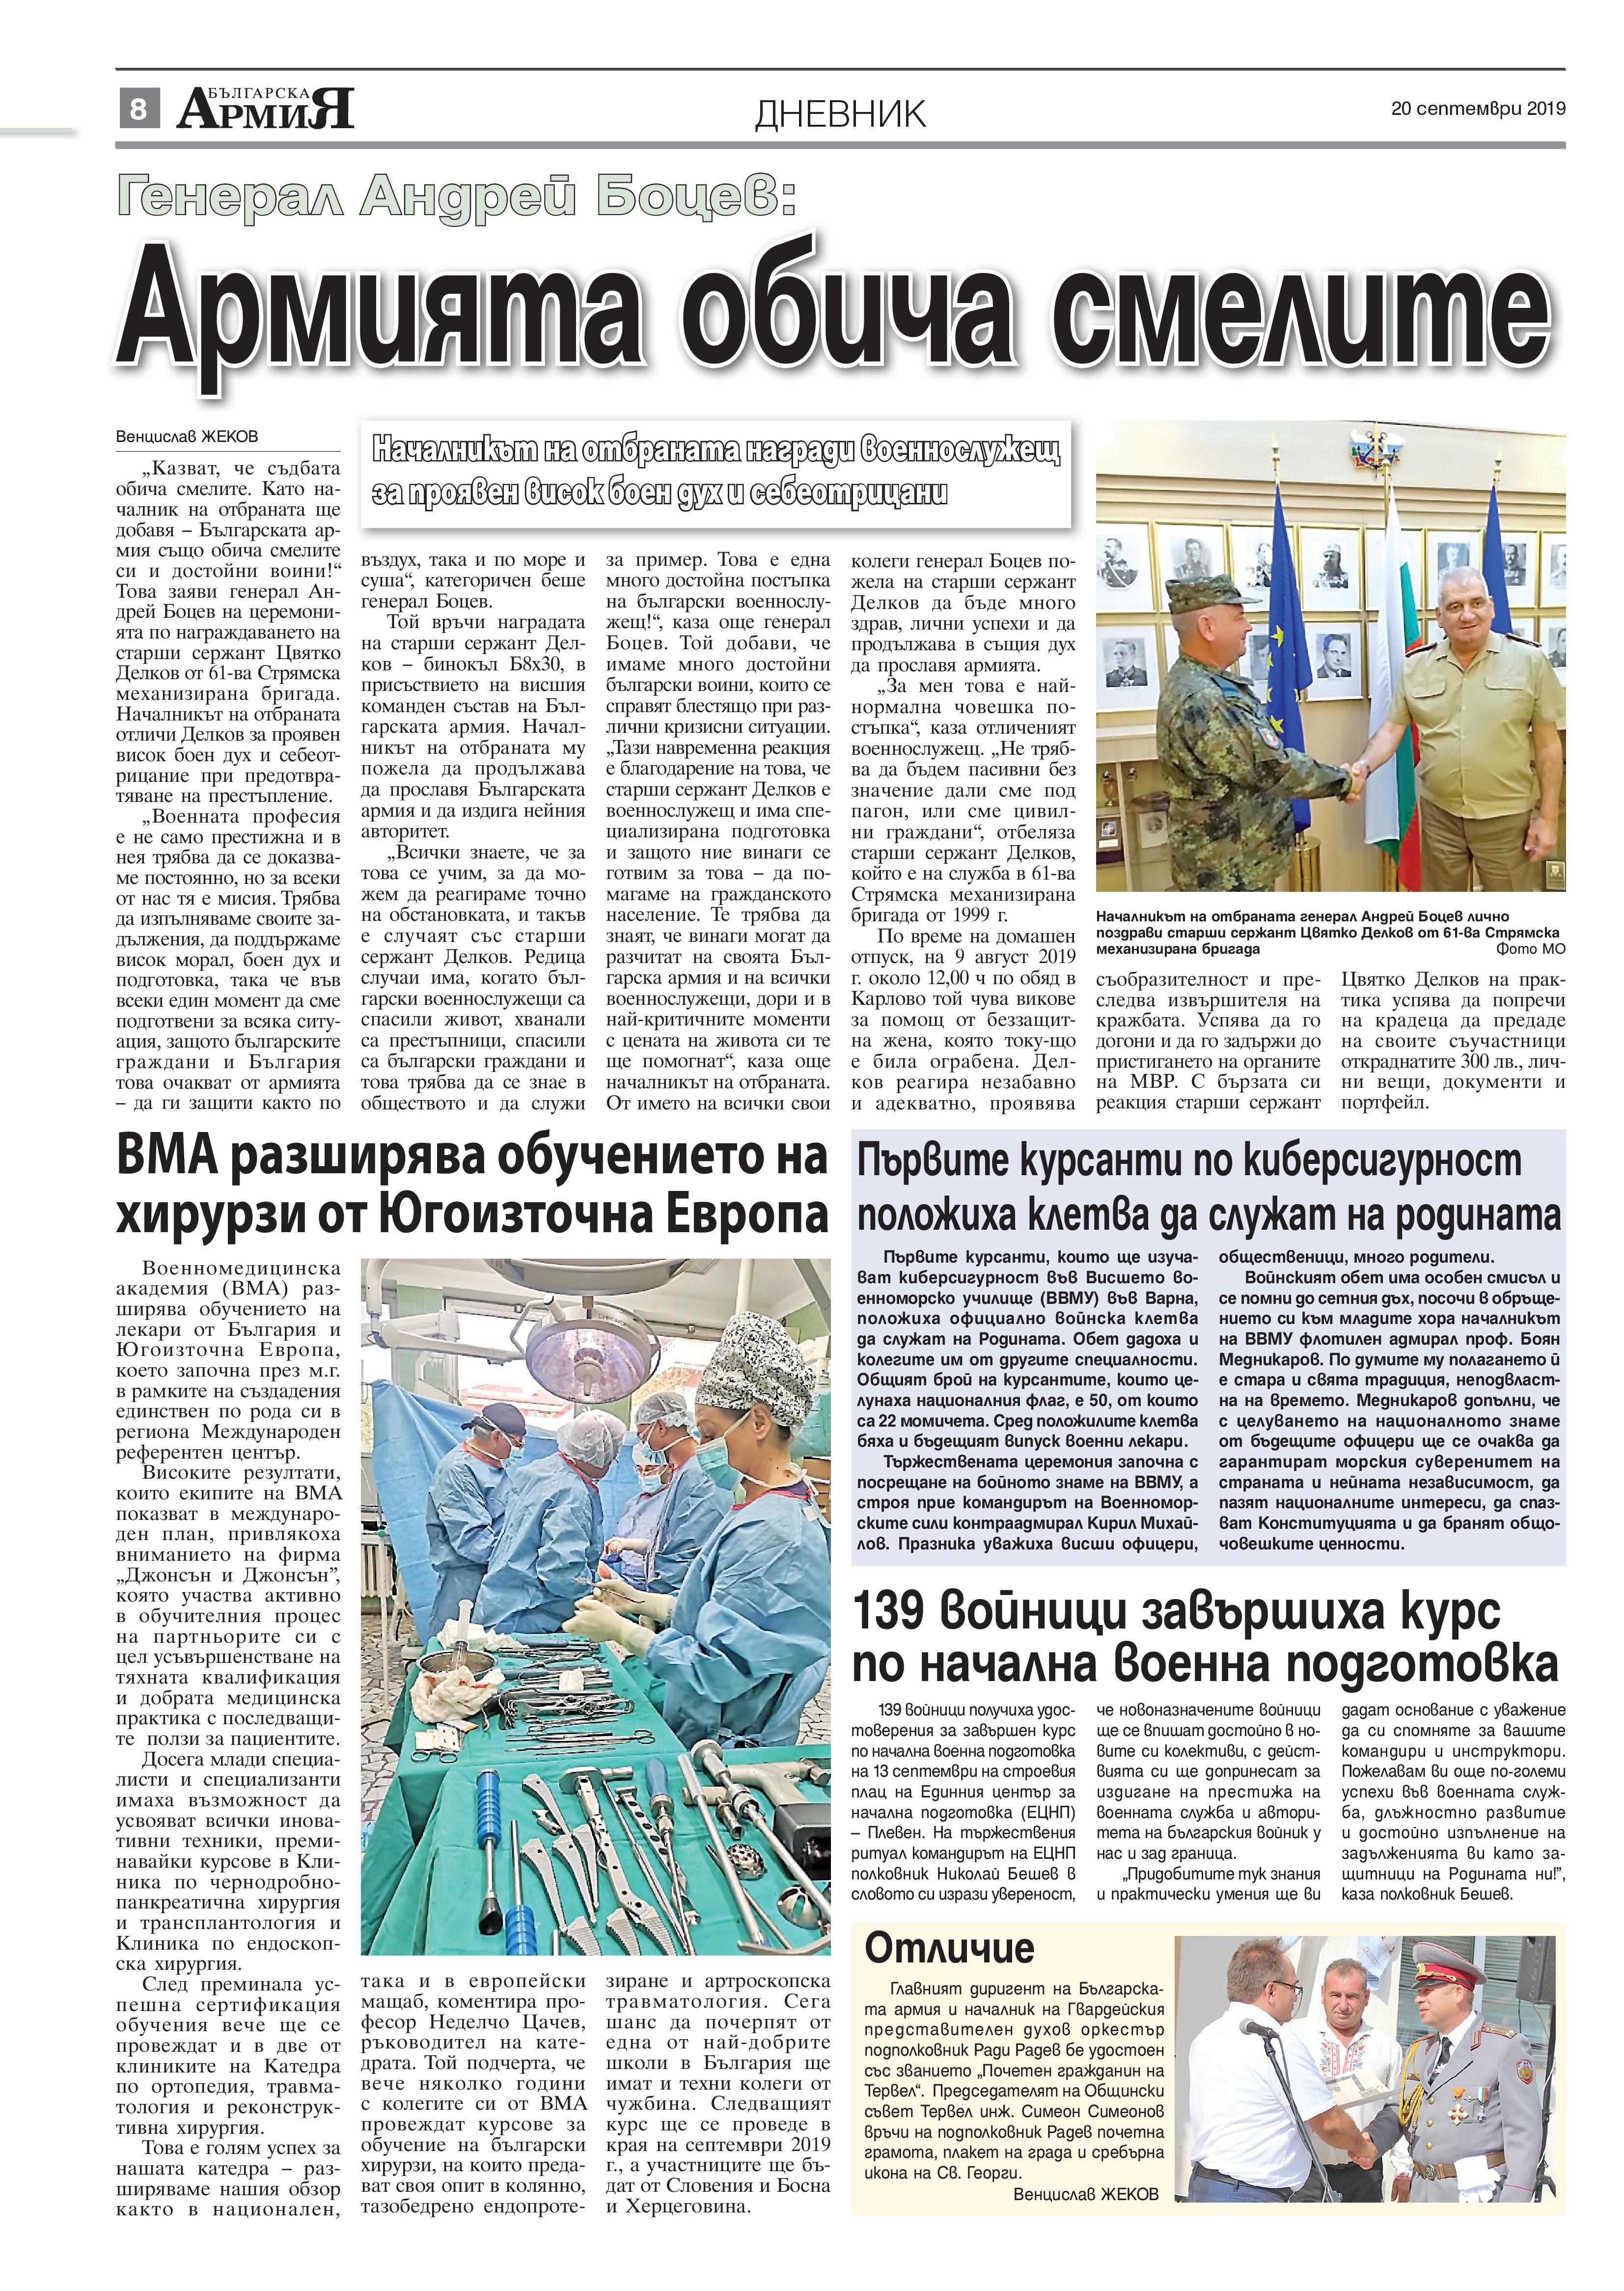 https://www.armymedia.bg/wp-content/uploads/2015/06/08-31.jpg